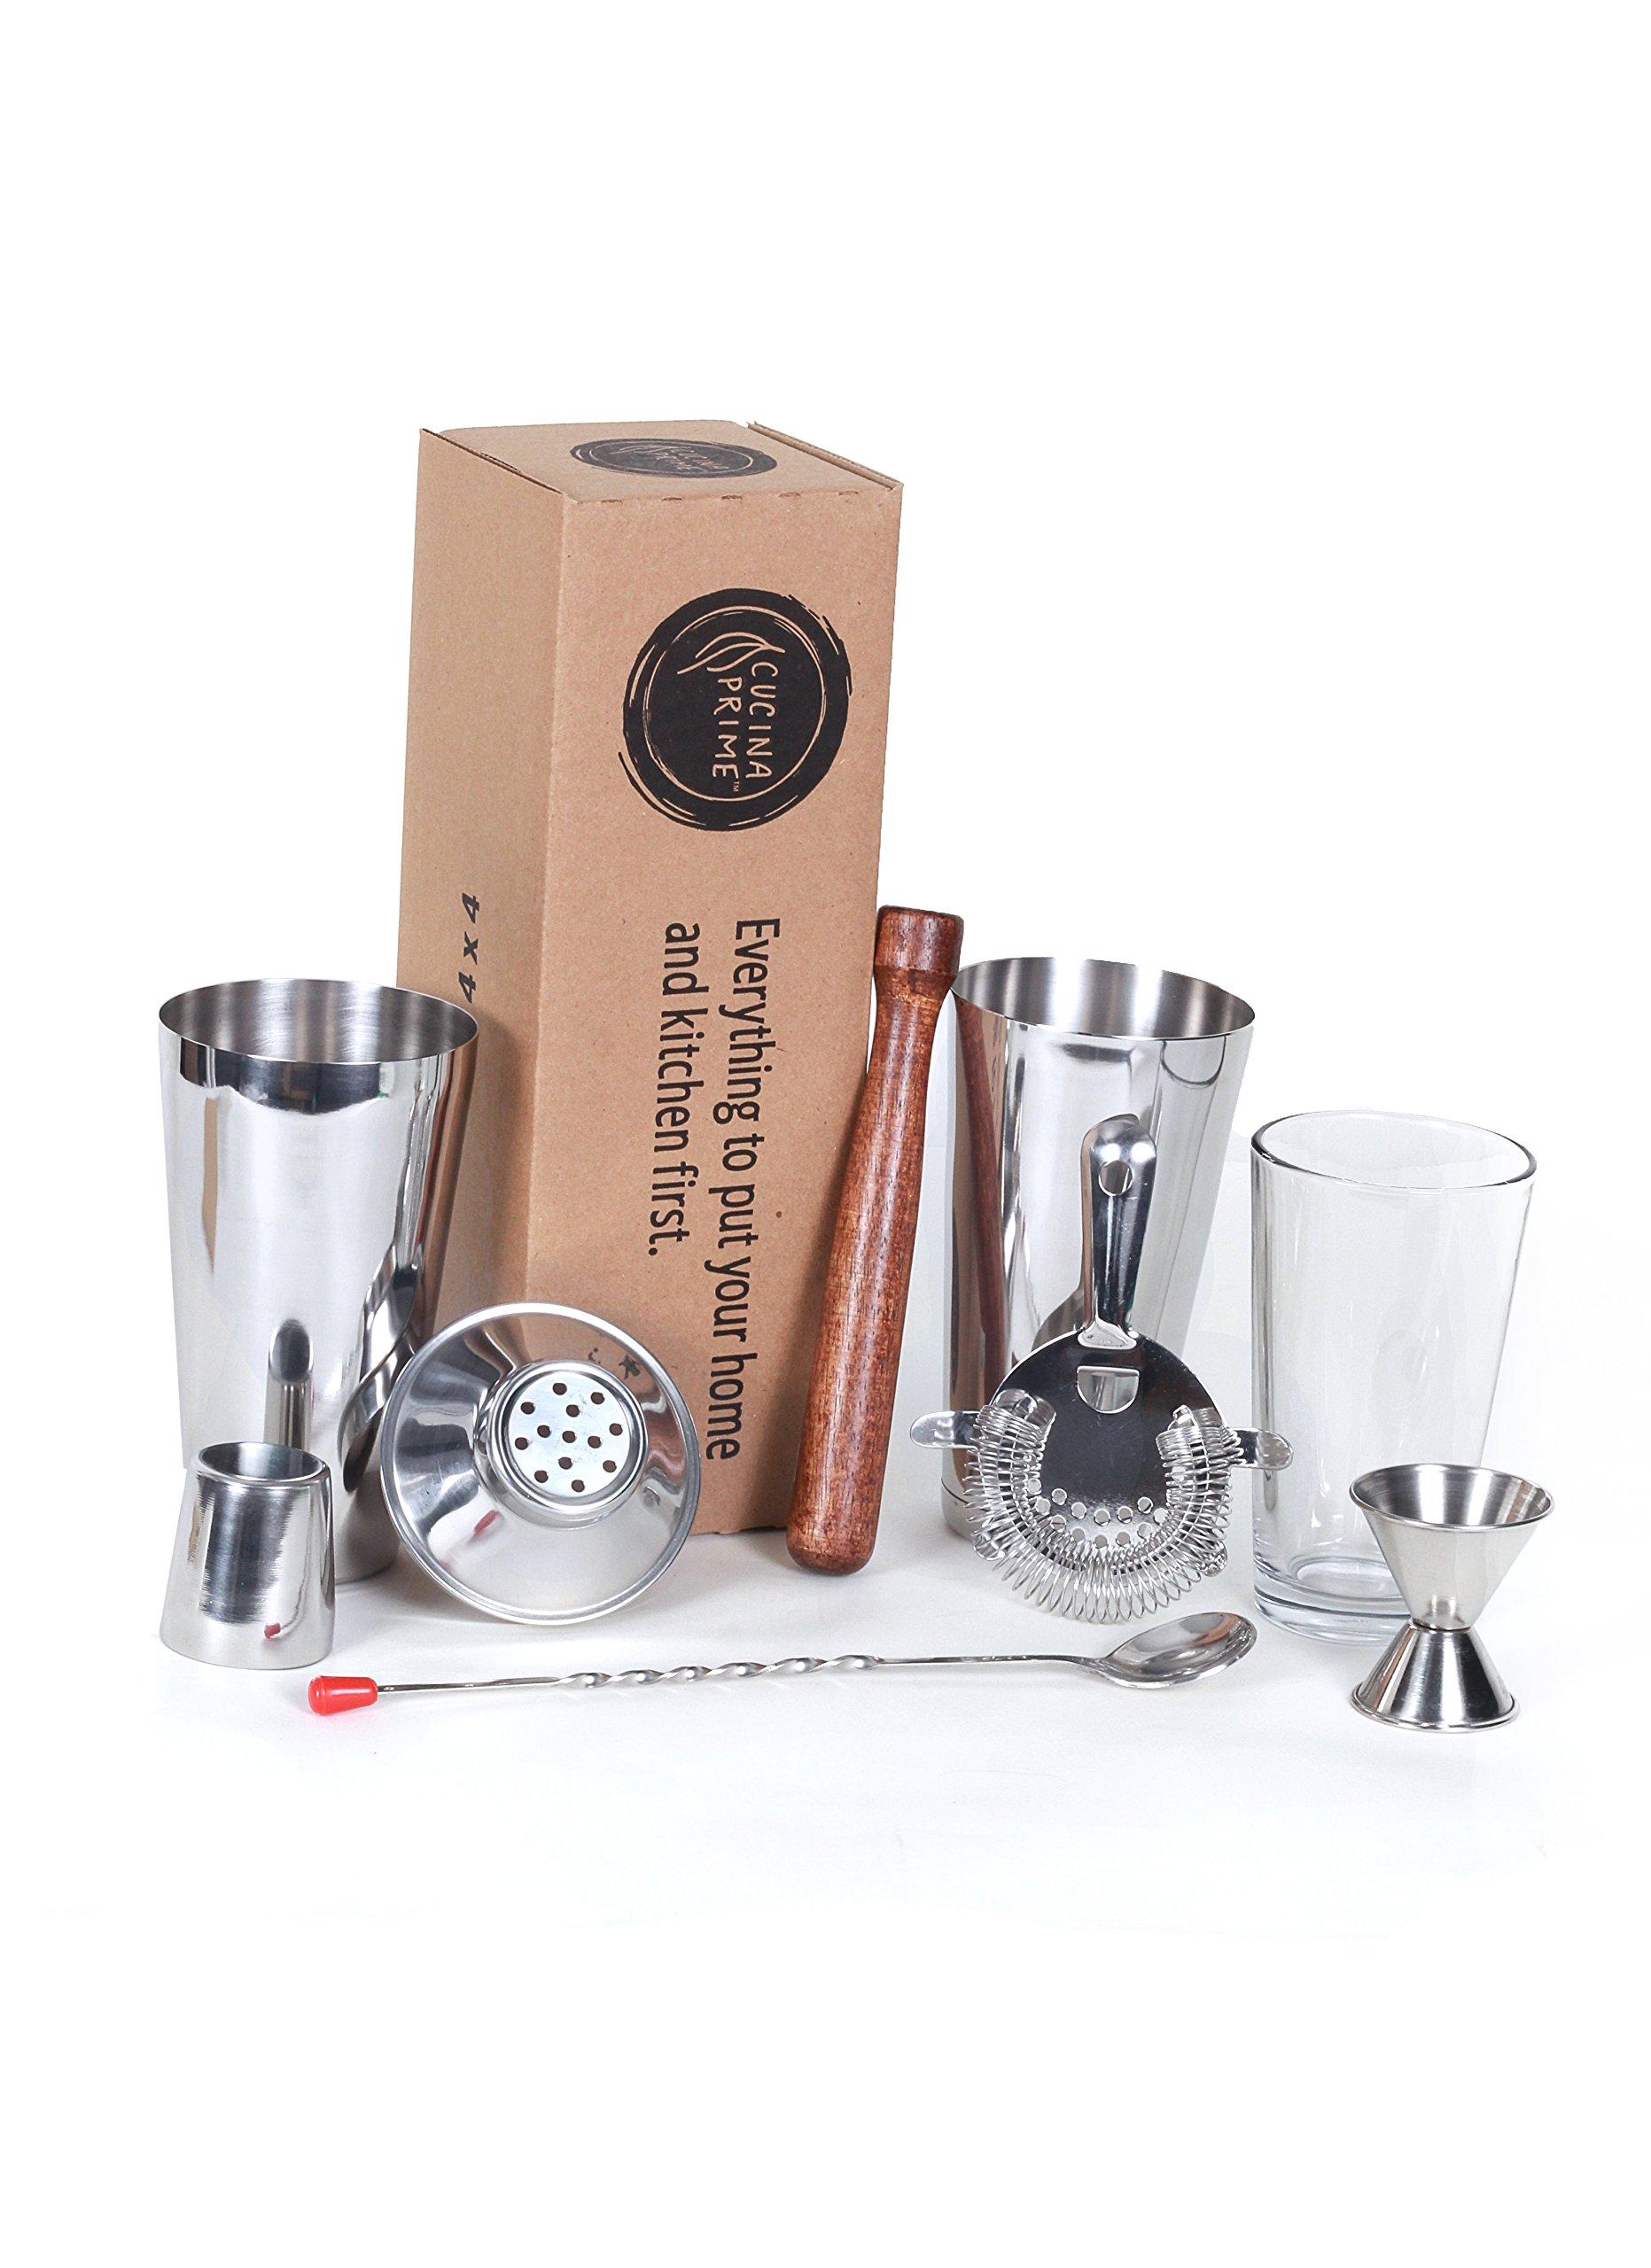 Cocktail Shaker Bar Set, Stainless Steel Bartender Cocktail Bar Kit, 9 Pieces